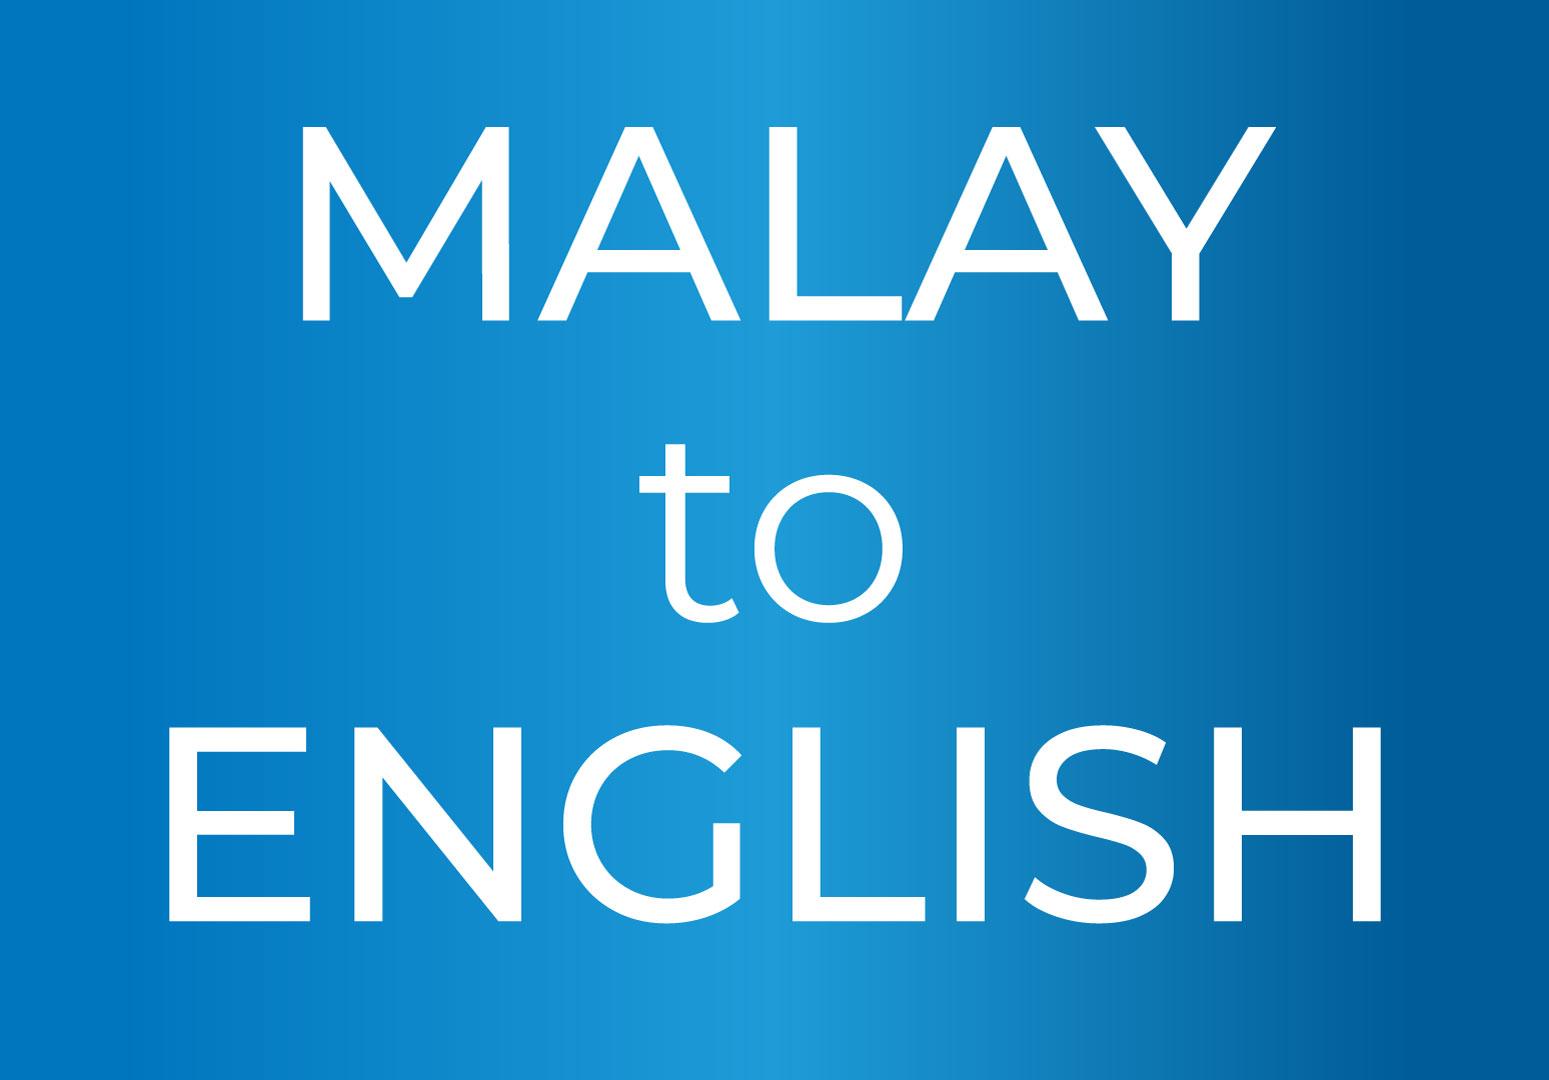 English to Malay translation (anything)